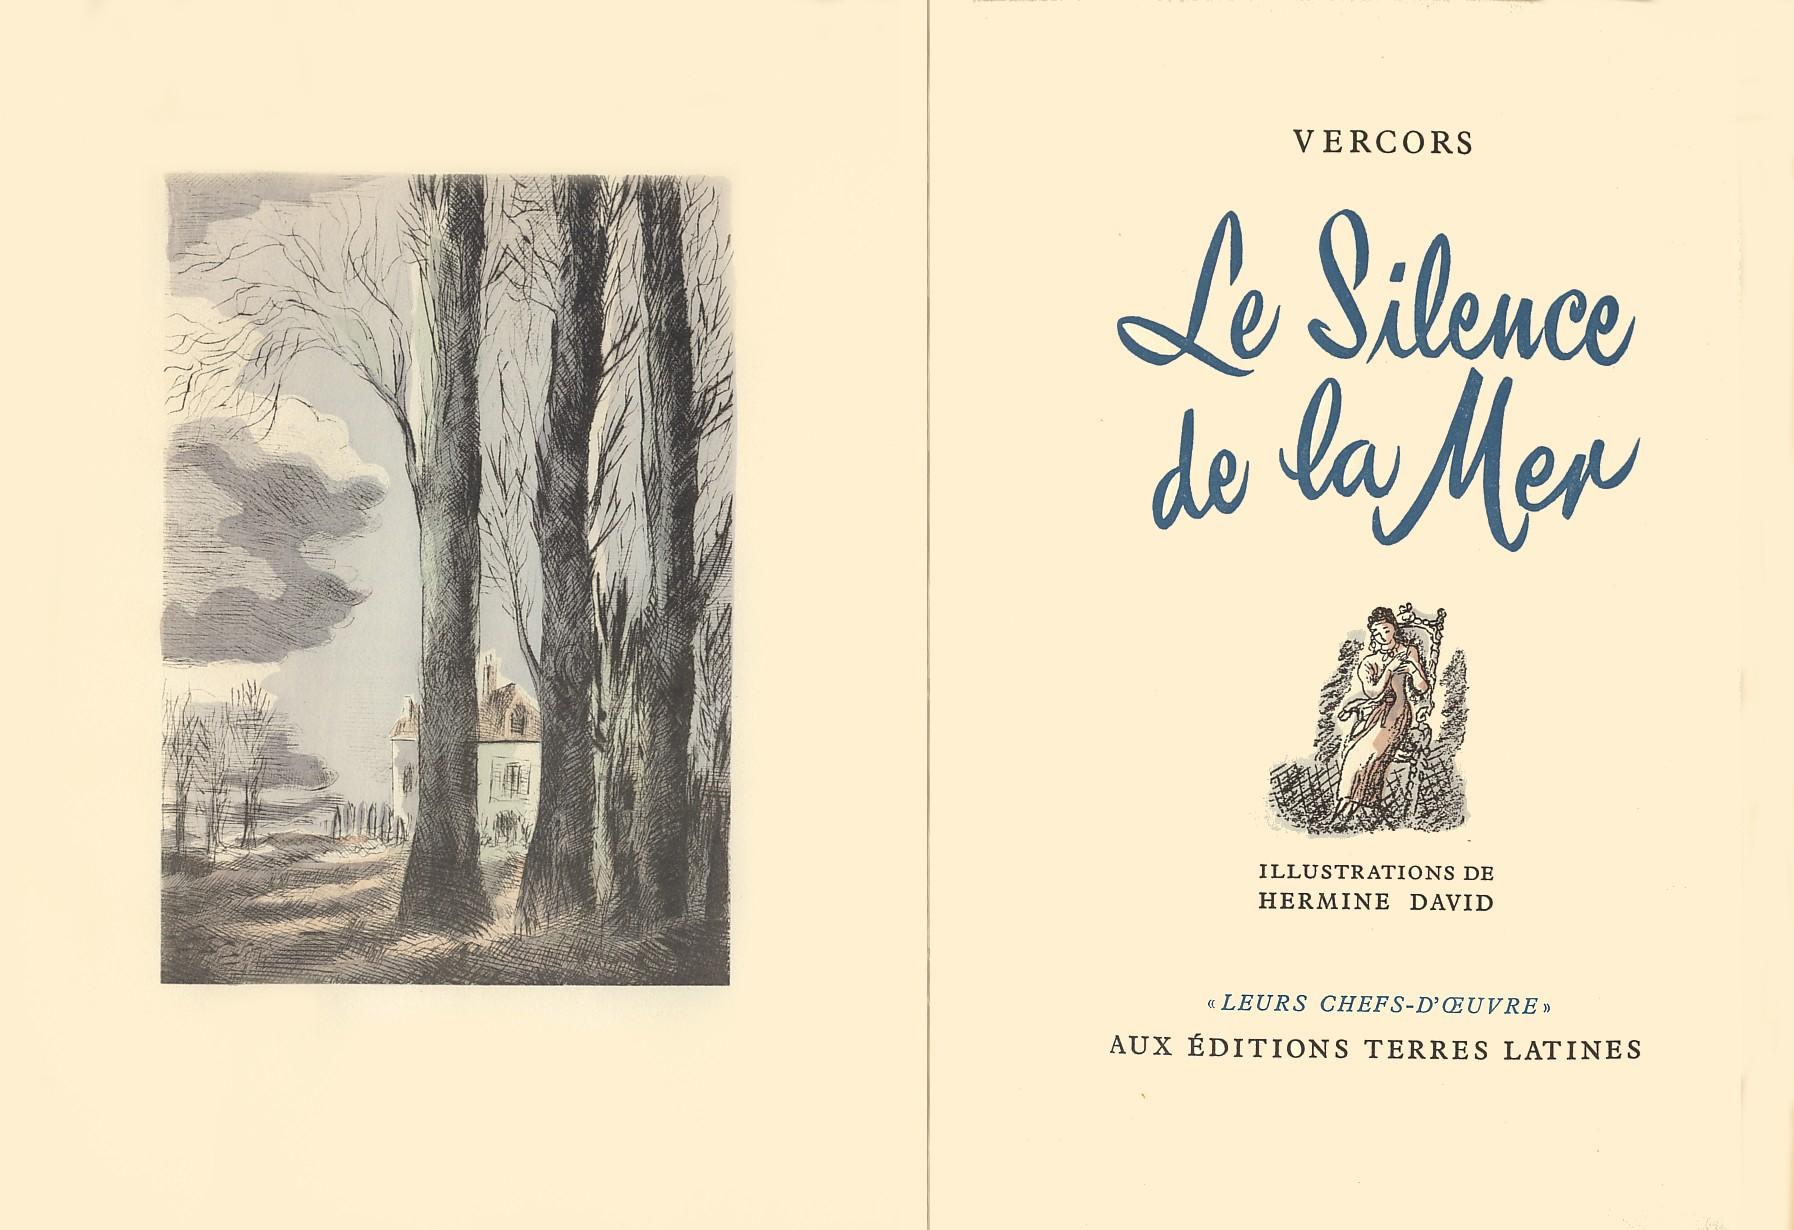 Le silence de la mer. - Aux Editions Terres Latines. Collection